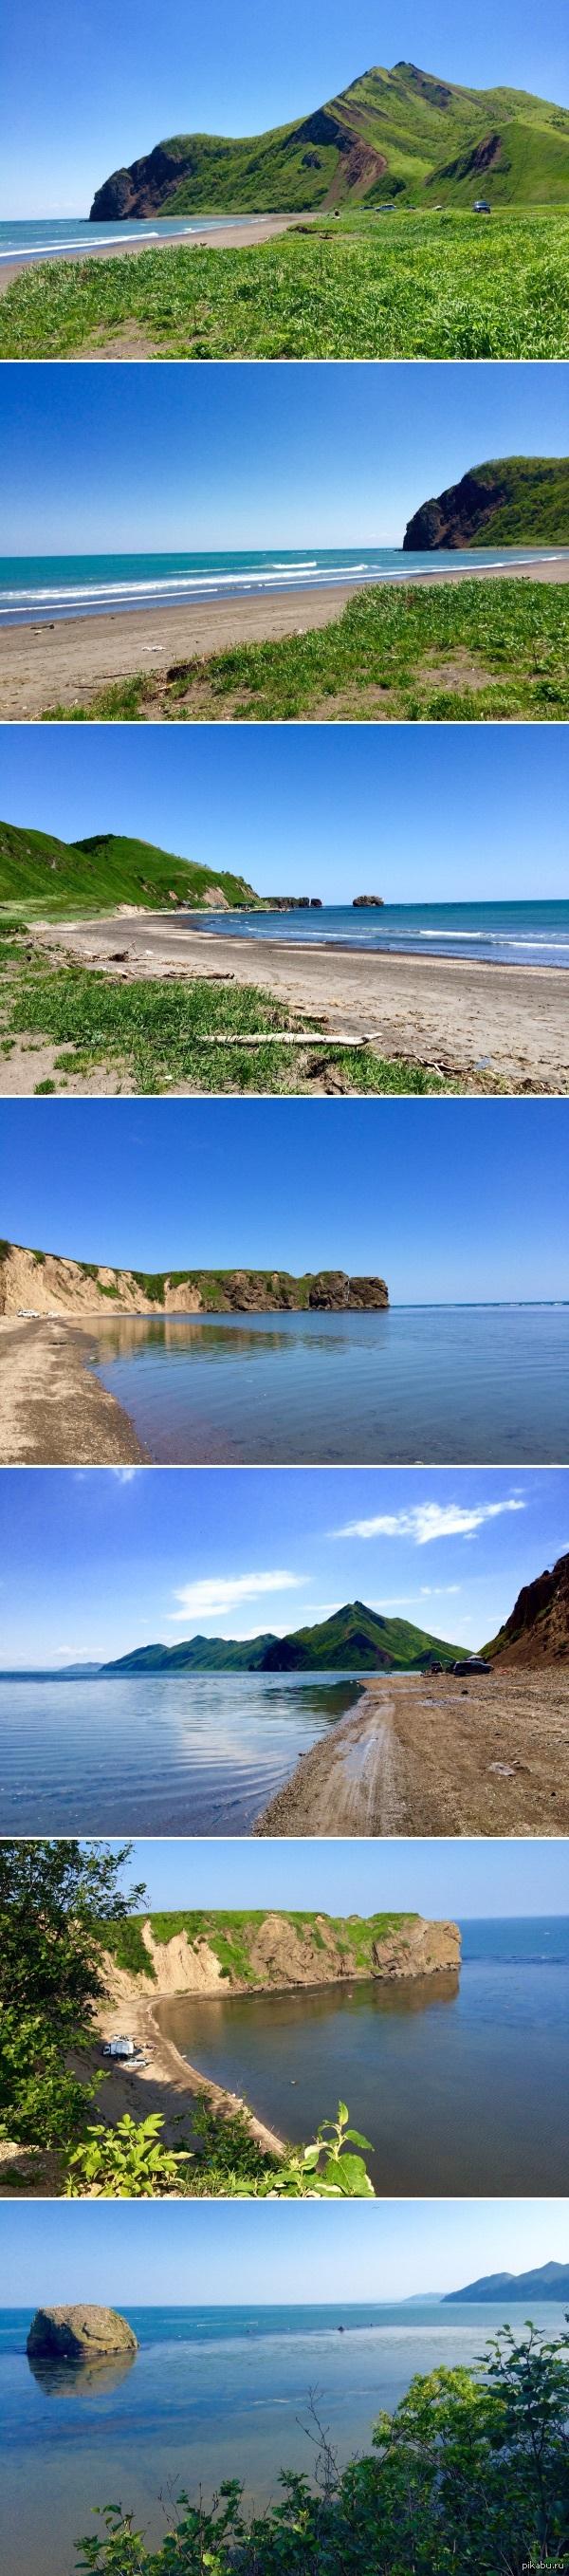 Остров Сахалин, Бухтая Тихая (Макаровский район) Около 130 км от Южно-Сахалинска. Фотал на 5s.